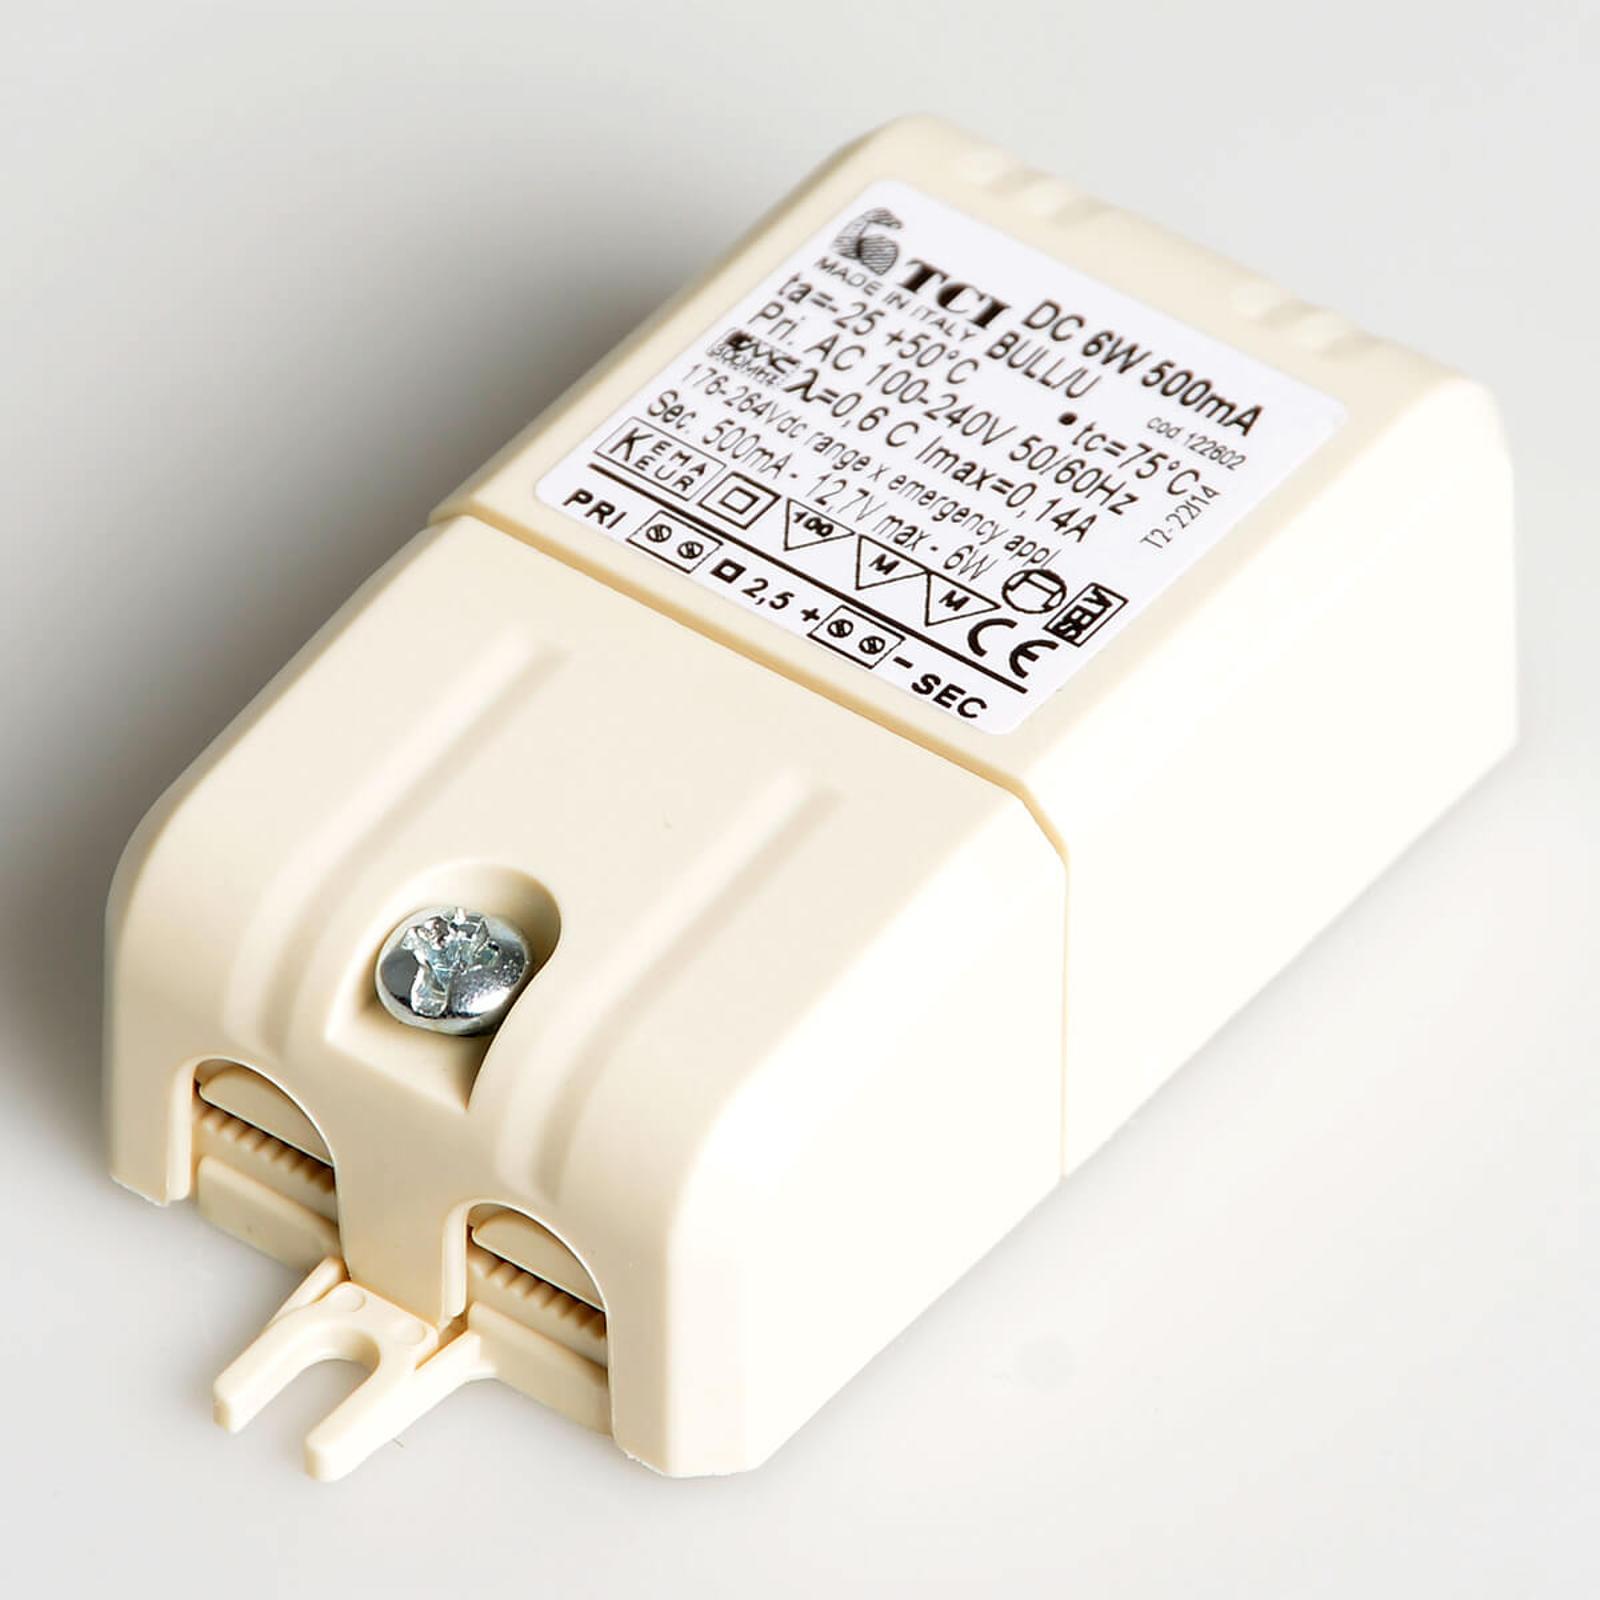 LED converter belknop brievenbus Letterman